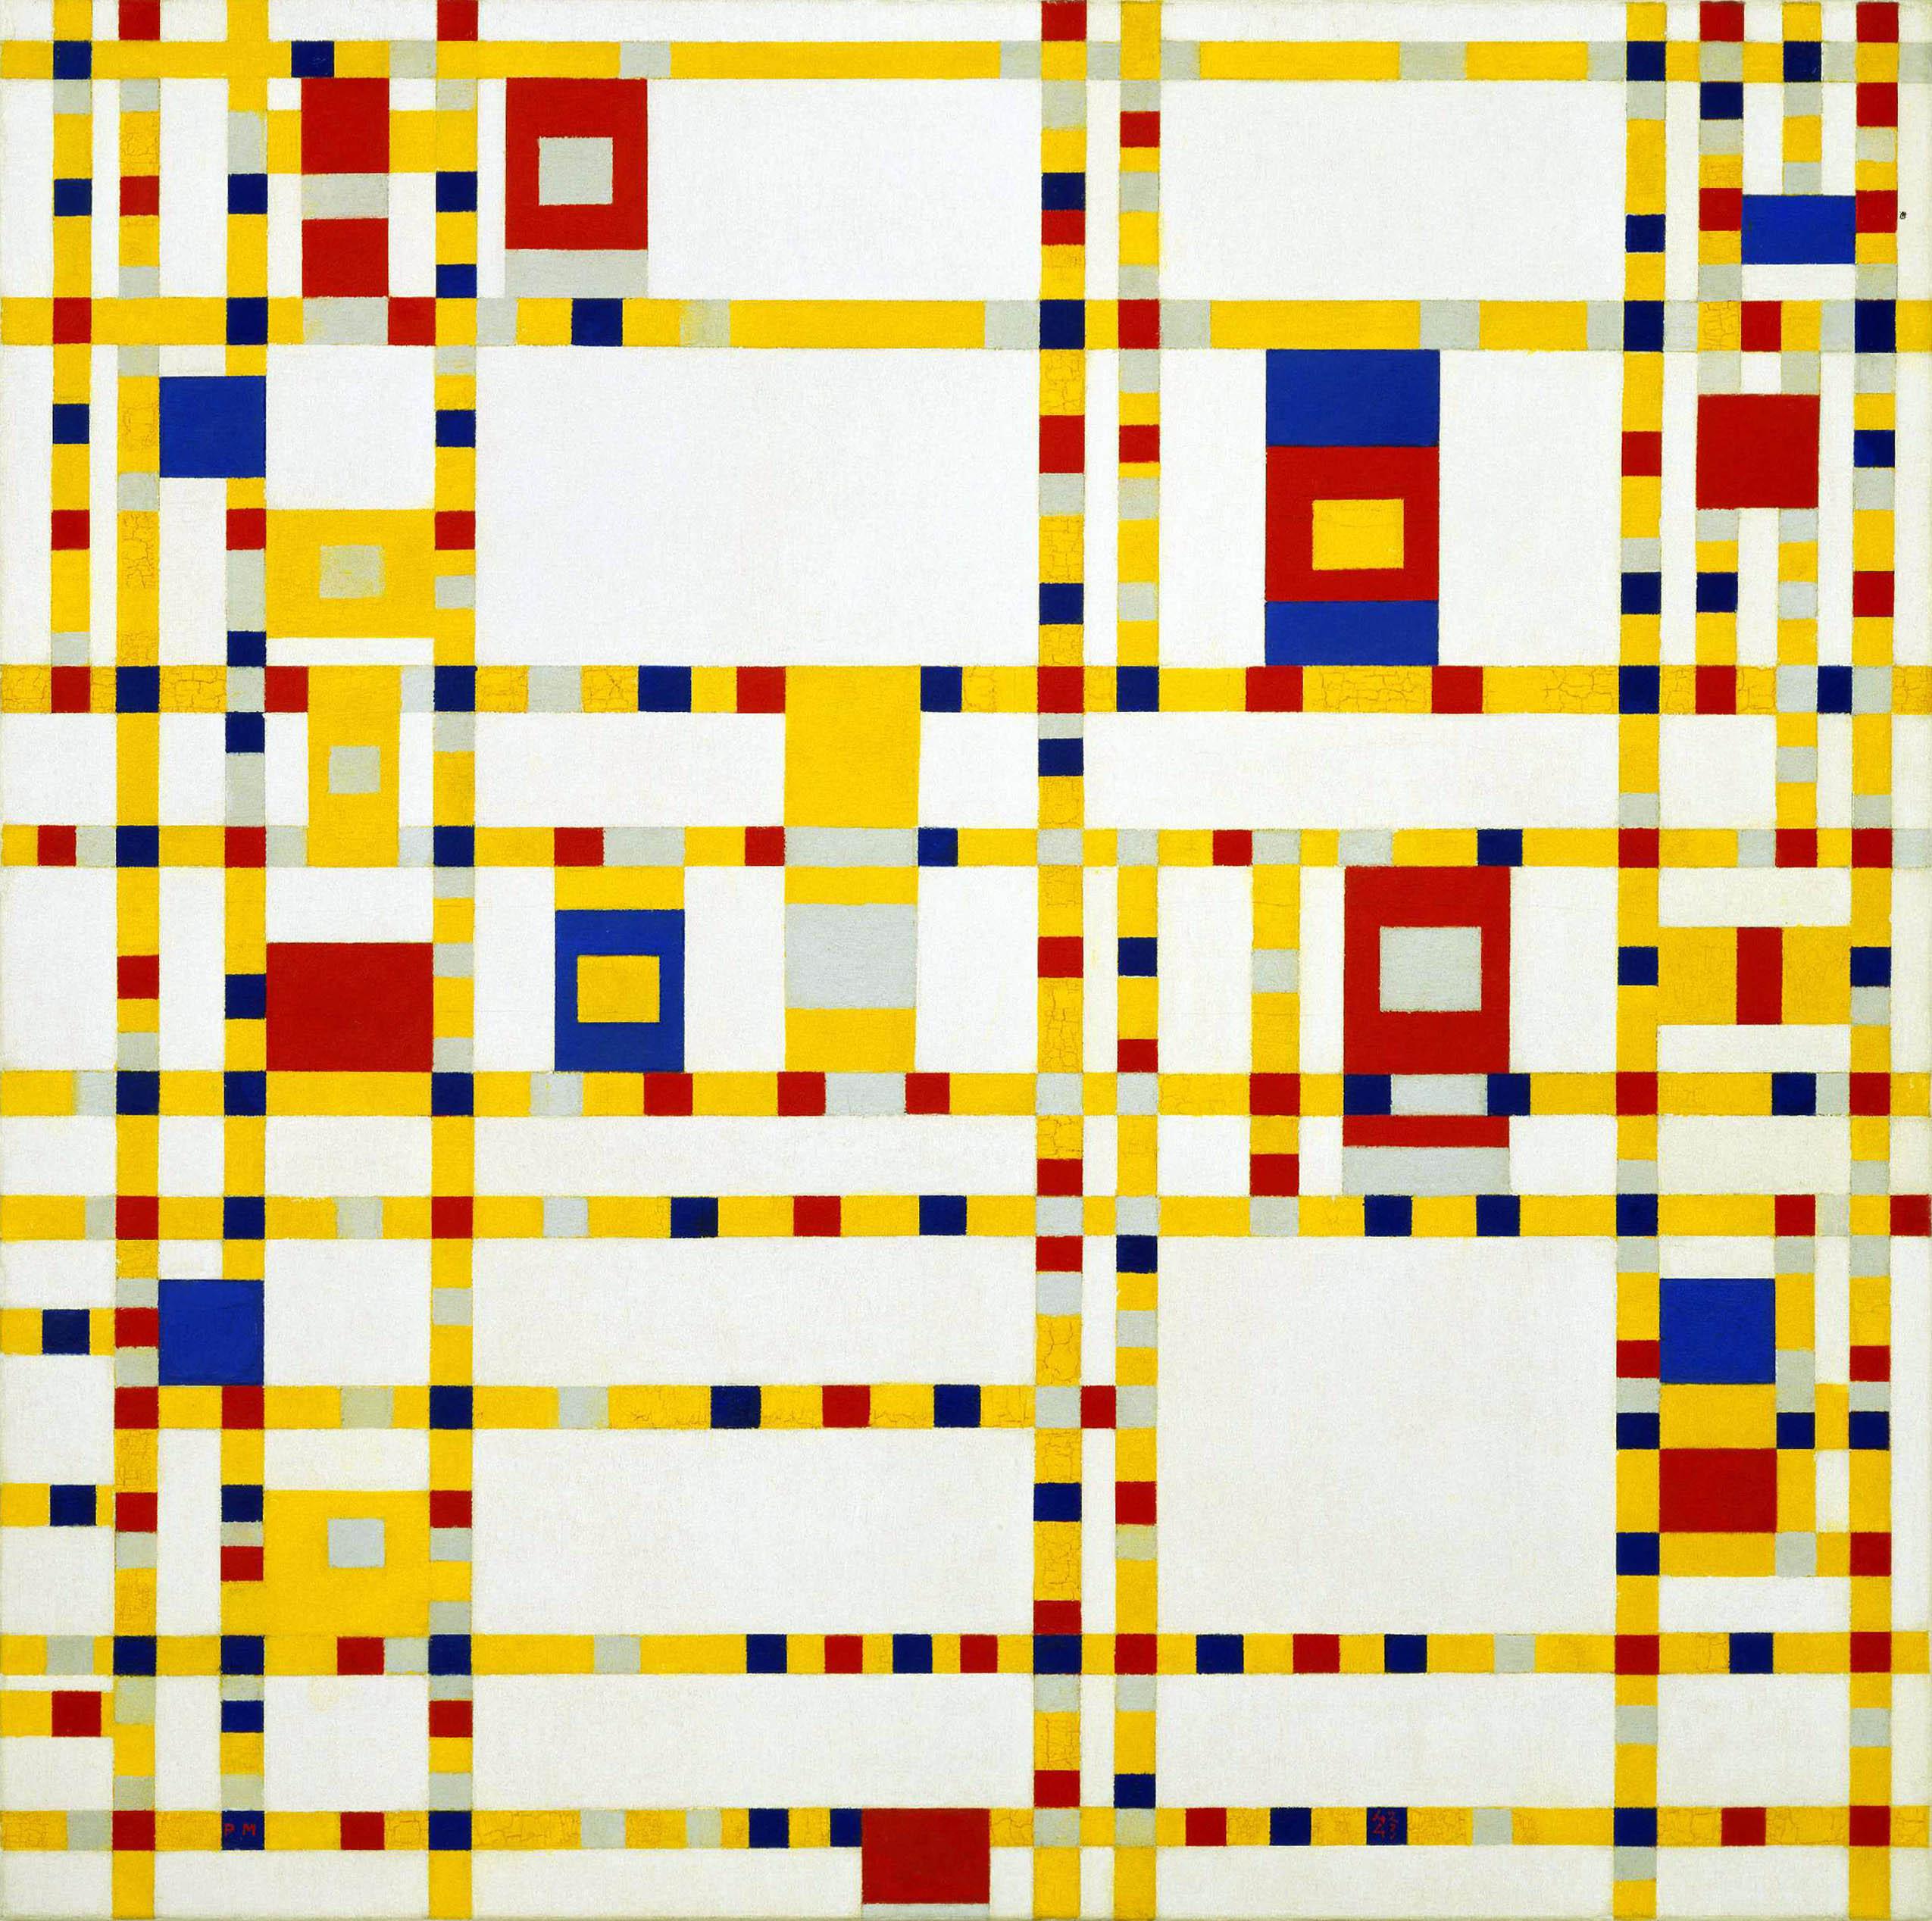 Пит Мондриан - картина «Буги-вуги на Бродвее»   Piet Mondrian - Broadway Boogie Woogie